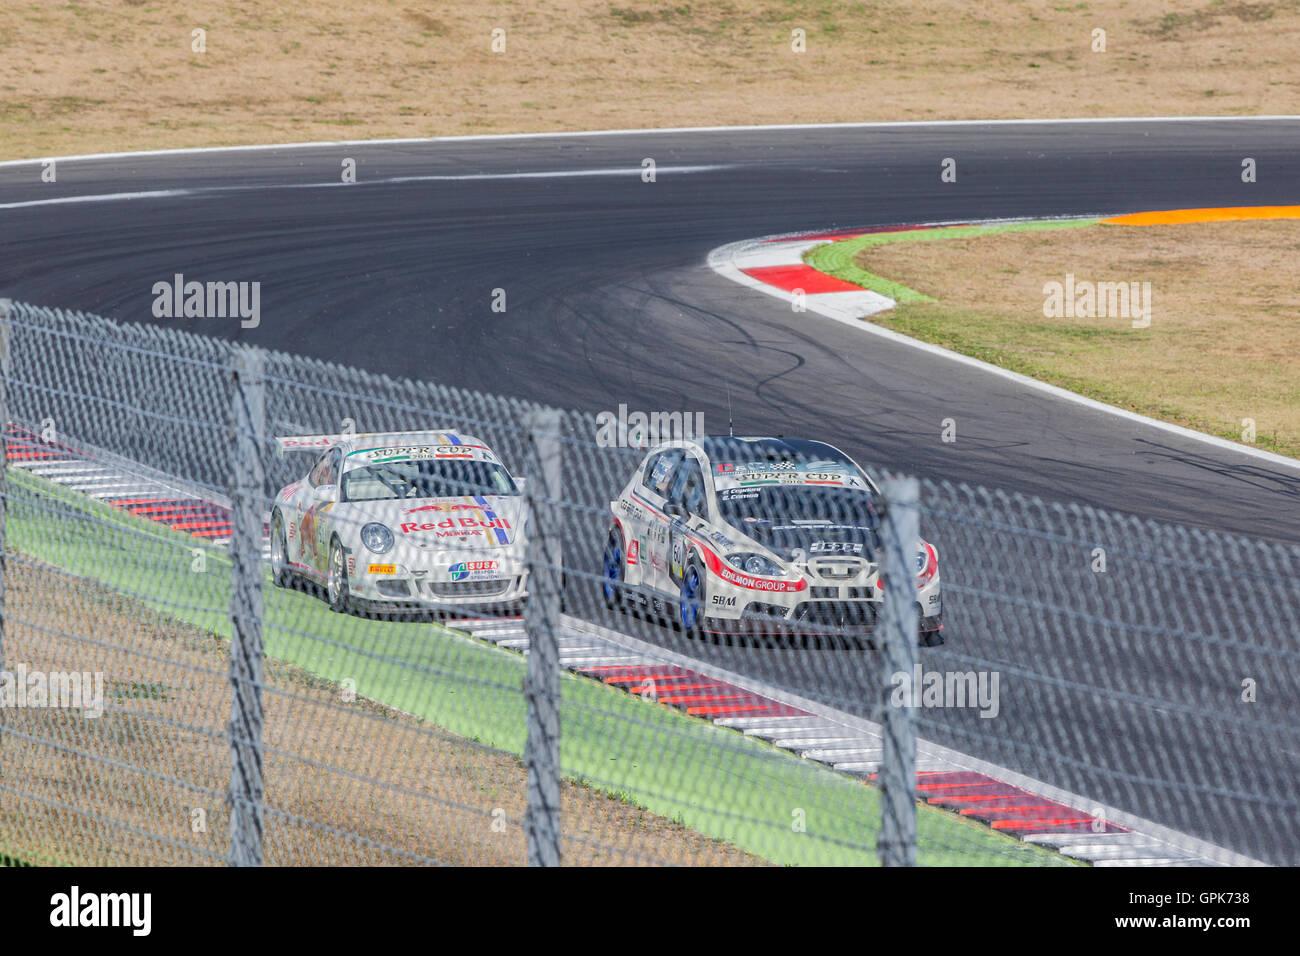 Circuito Vallelunga : Guida una formula renault sul circuito di vallelunga regali